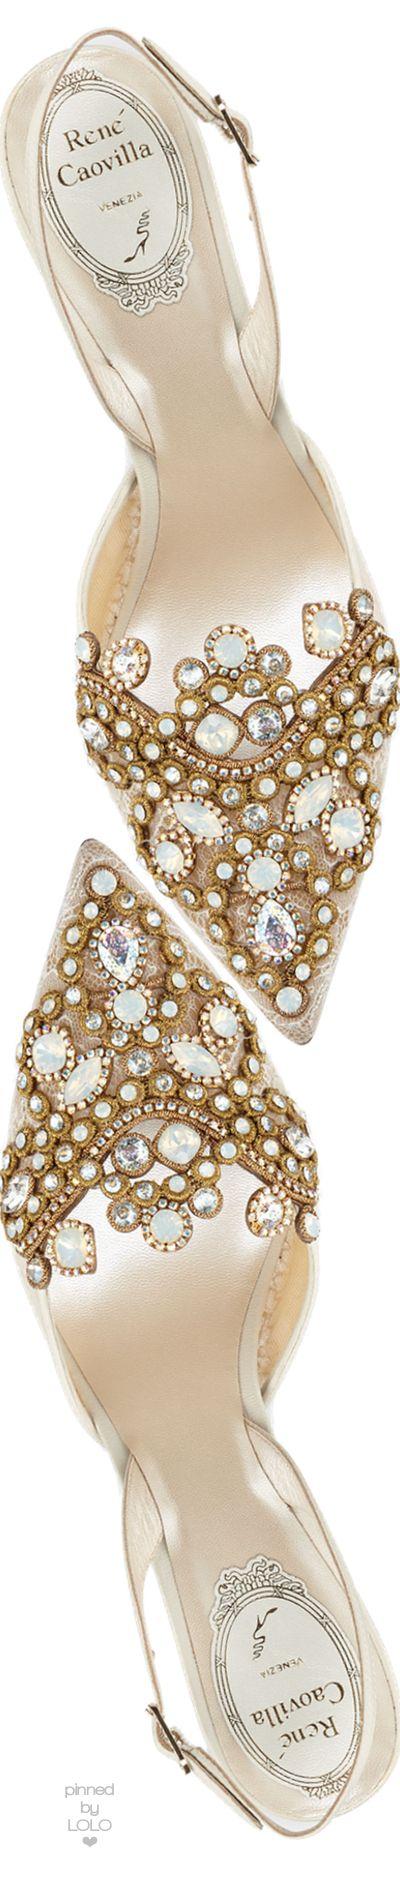 Rene Caovilla Jeweled Lace & Leather Halter Pump | LOLO❤︎